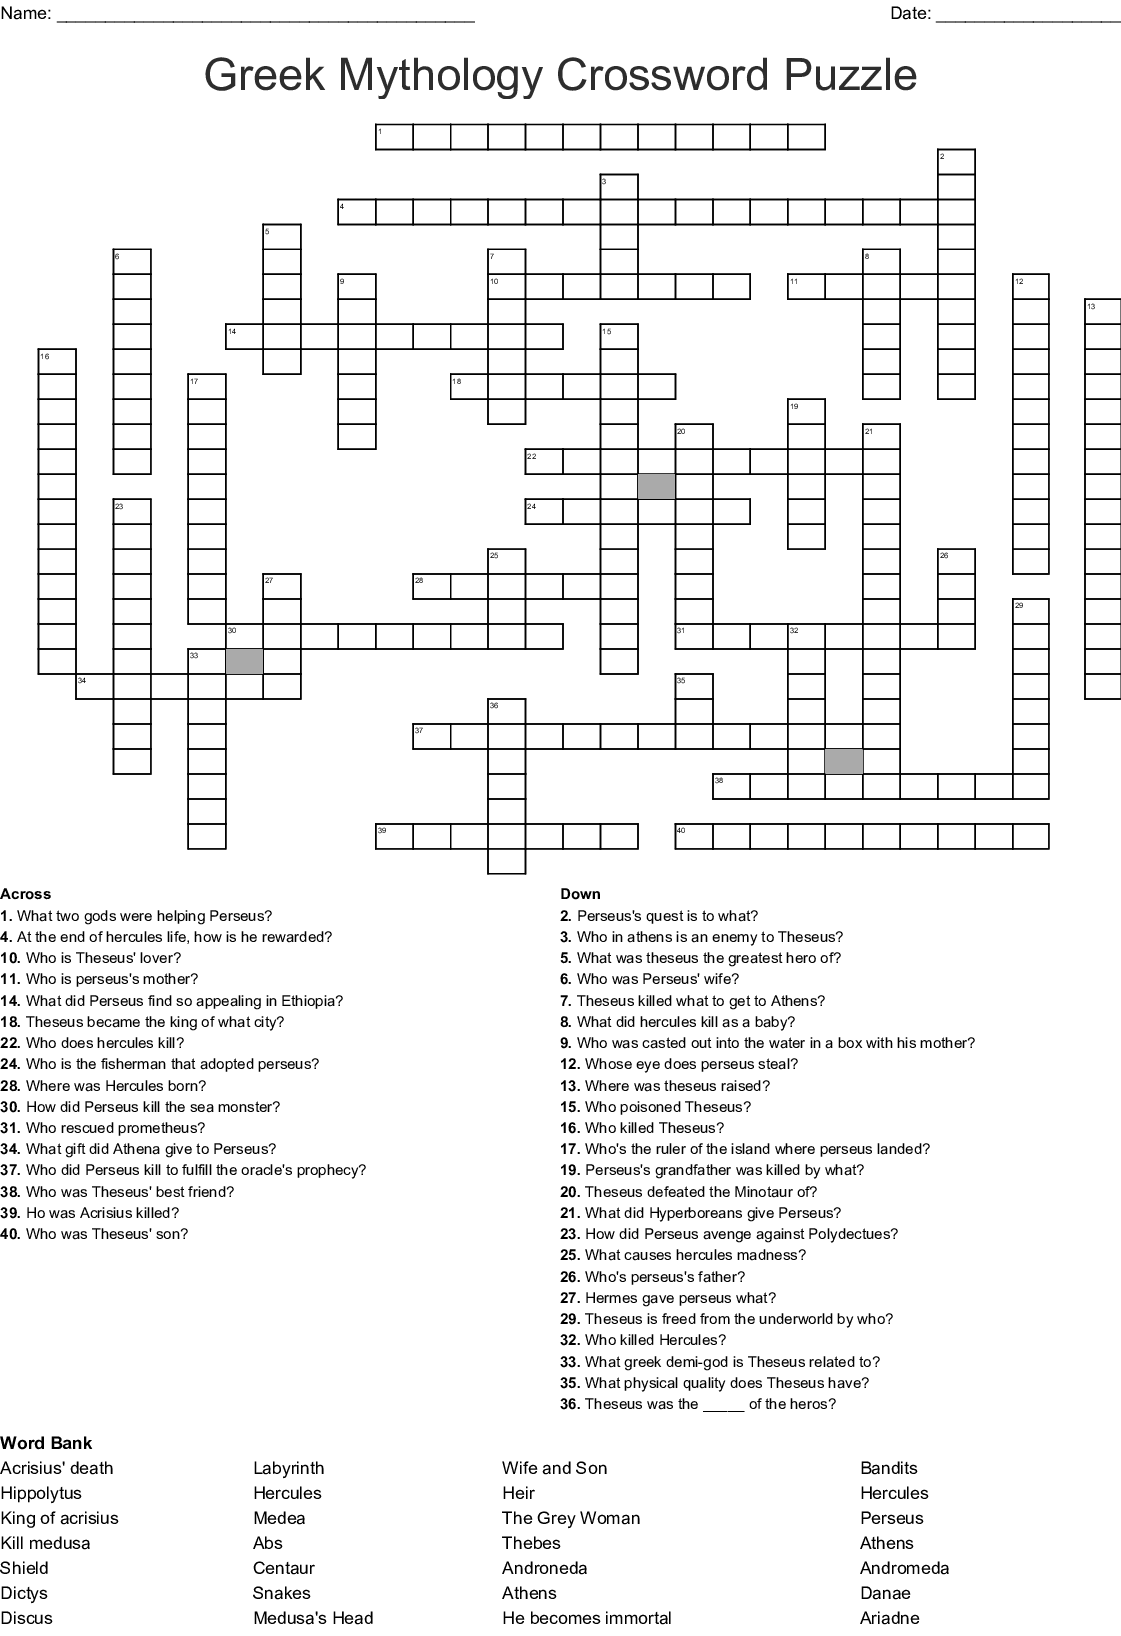 Atalanta Crossword